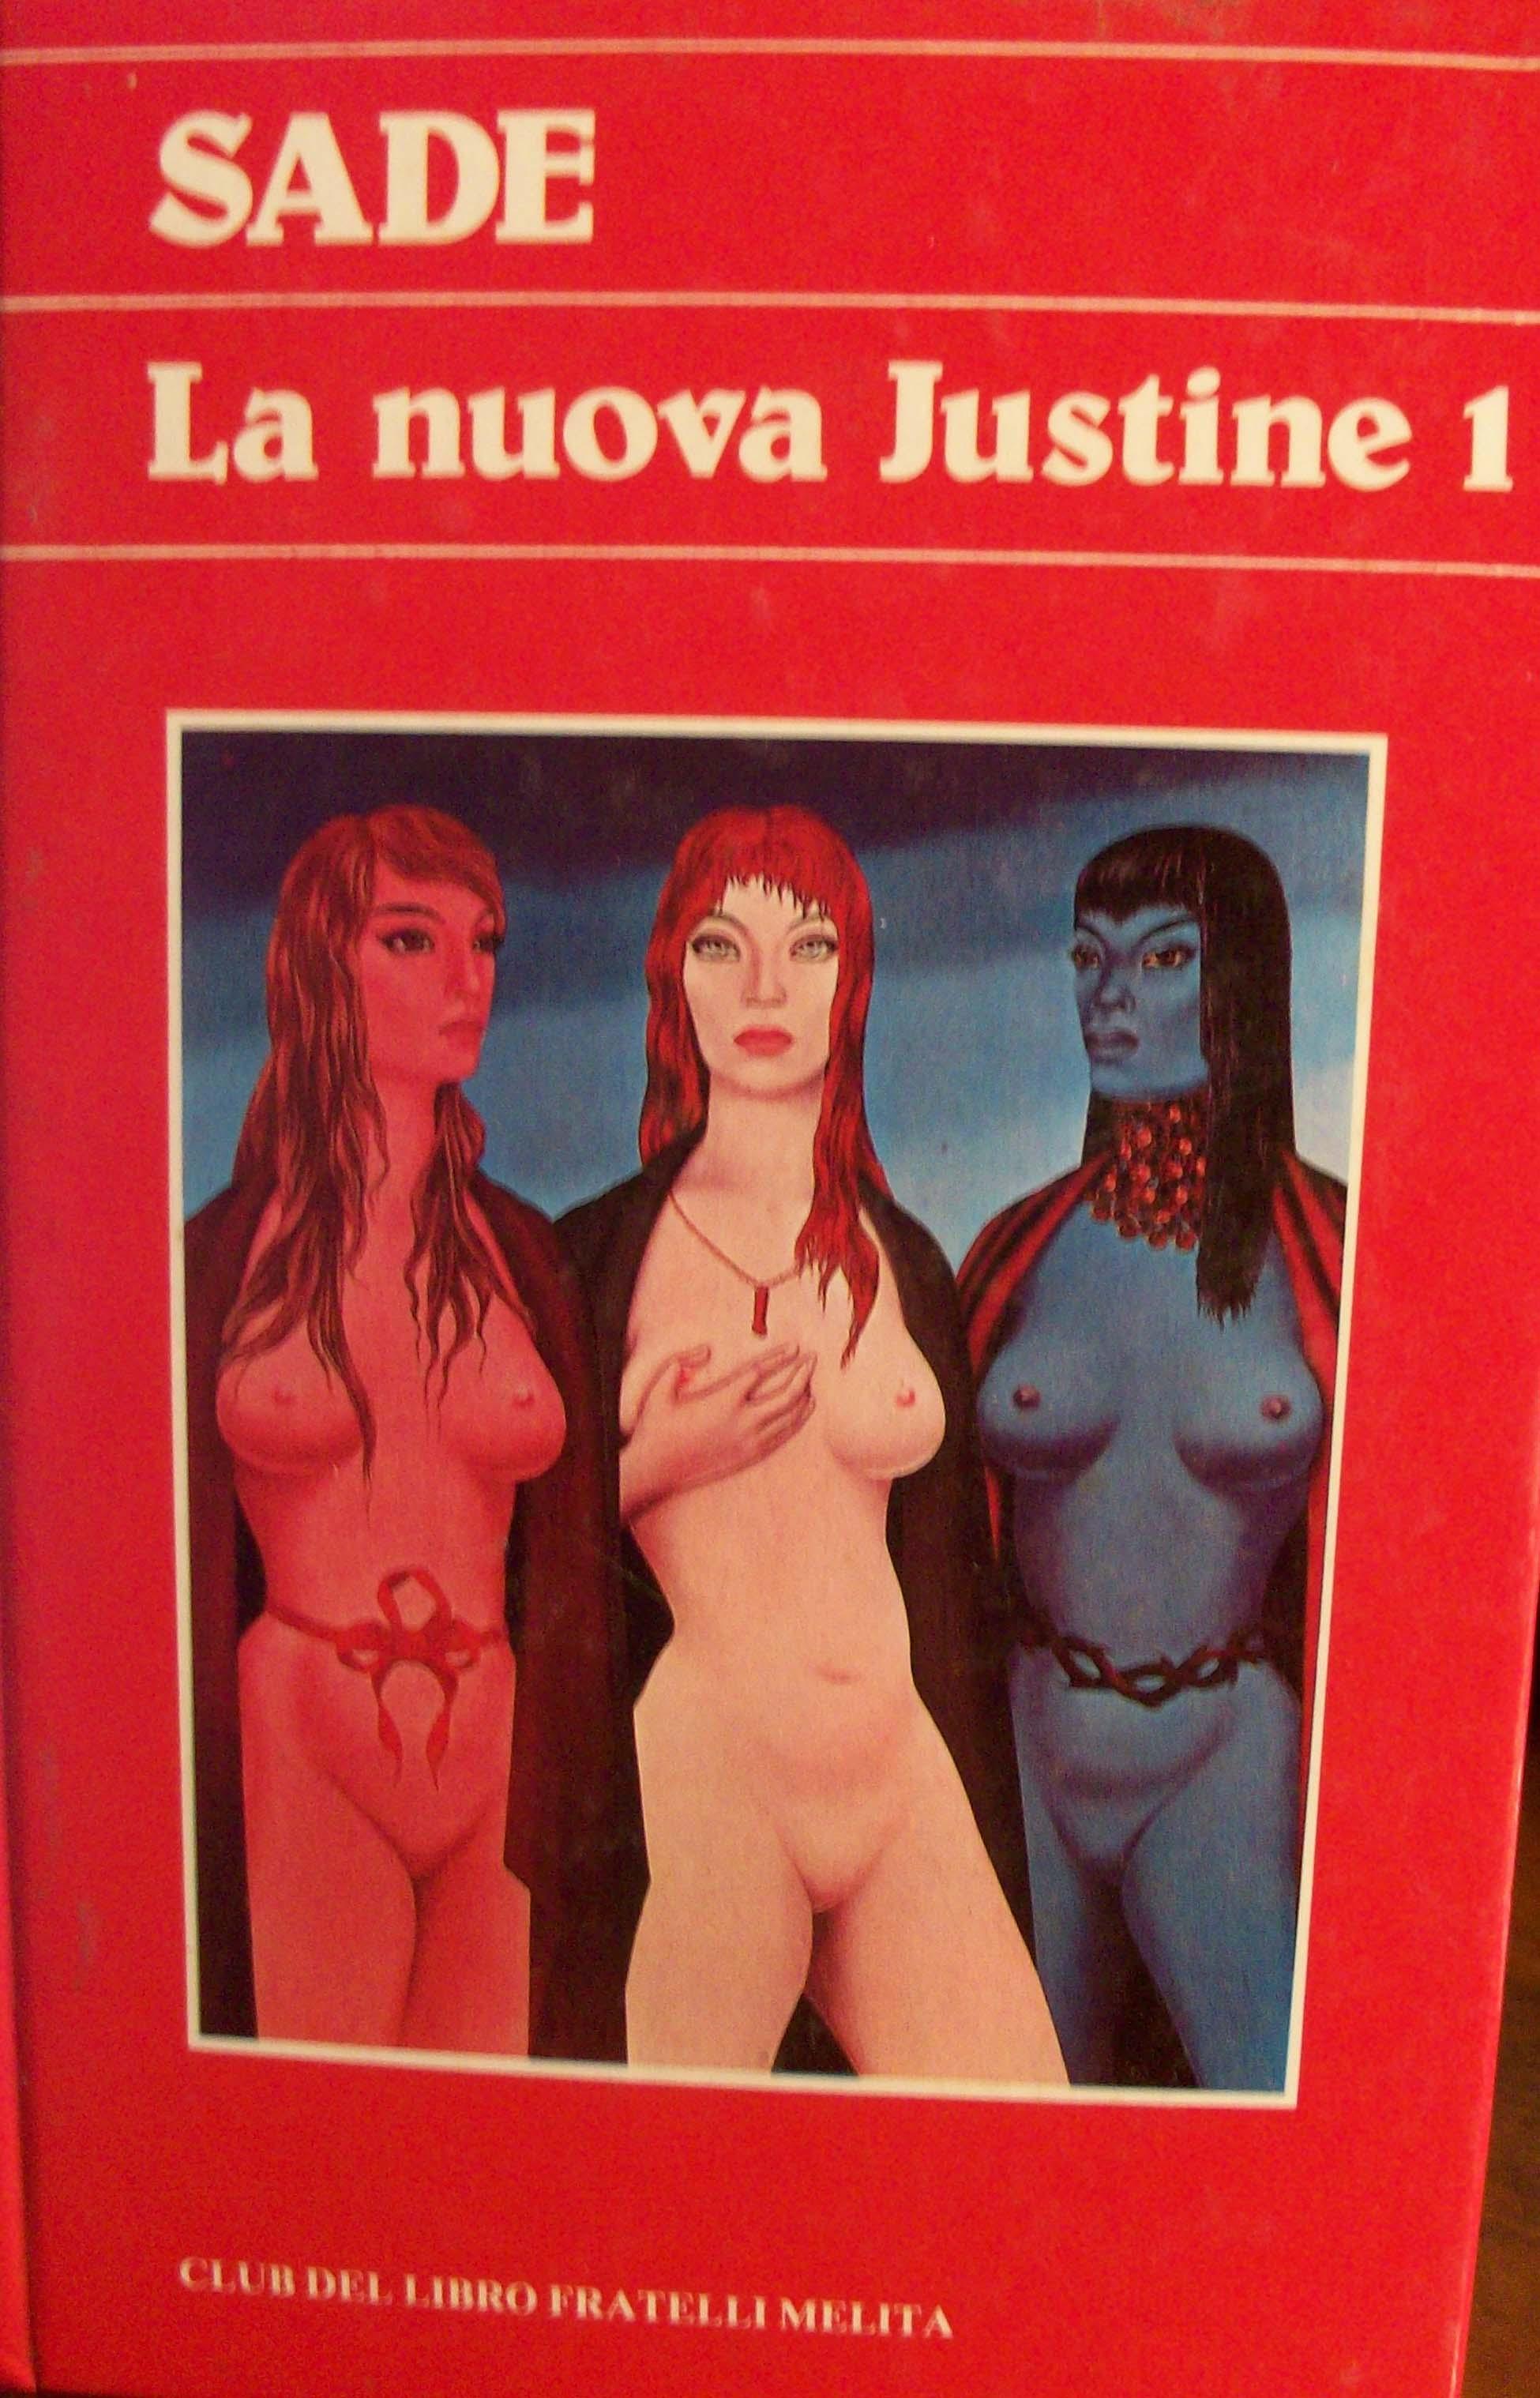 La nuova Justine vol. 1